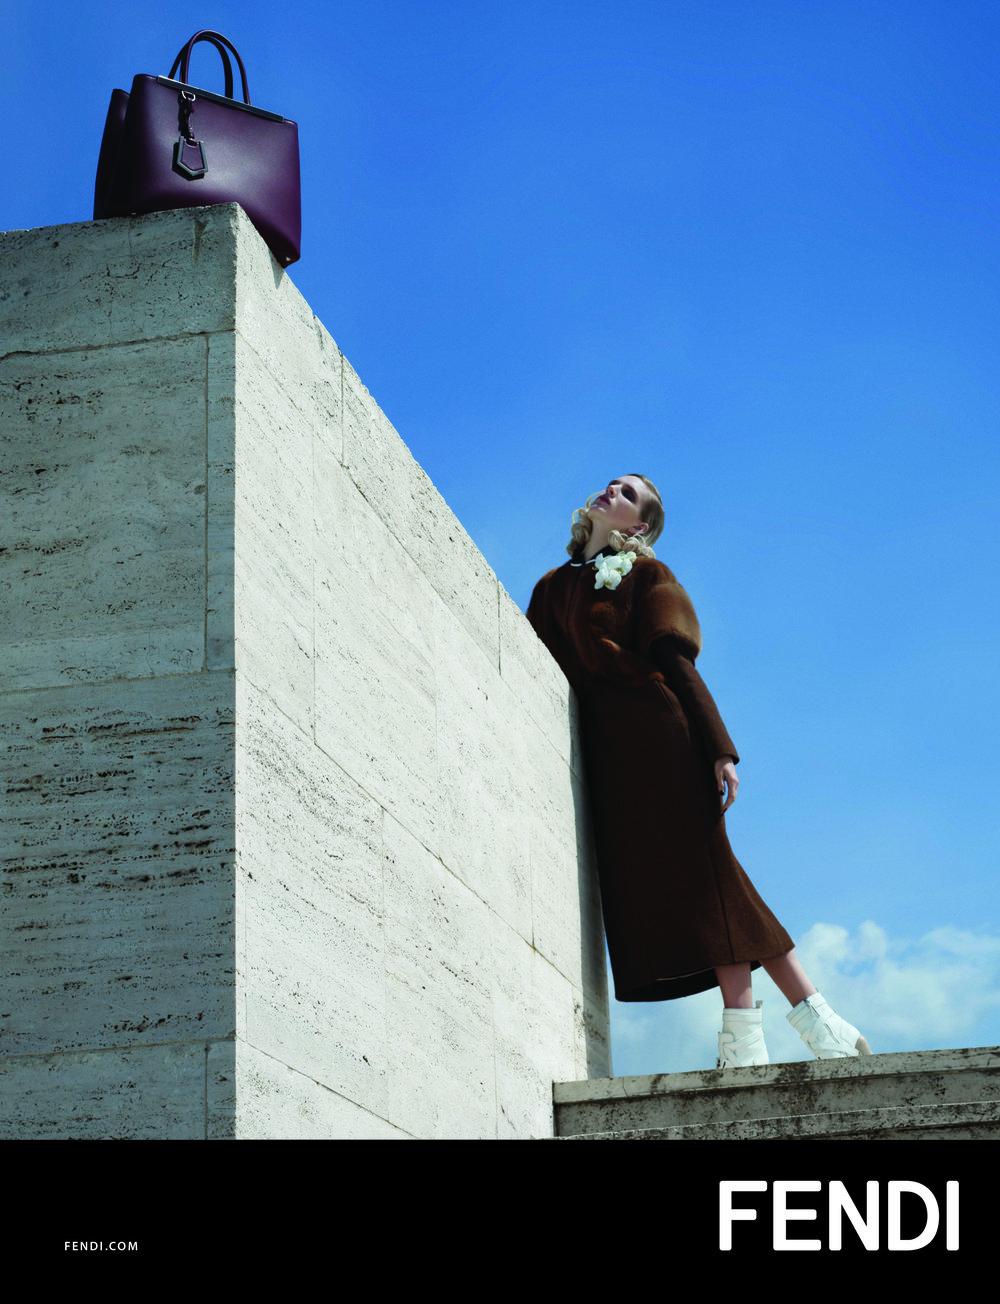 #fendi #karllagerfeld #fw14 #campaign #fashion #nadjabender #ashleighgood #charlottestockdale #amandaharlech #jimkaemmerling #tompecheux #sammcknight